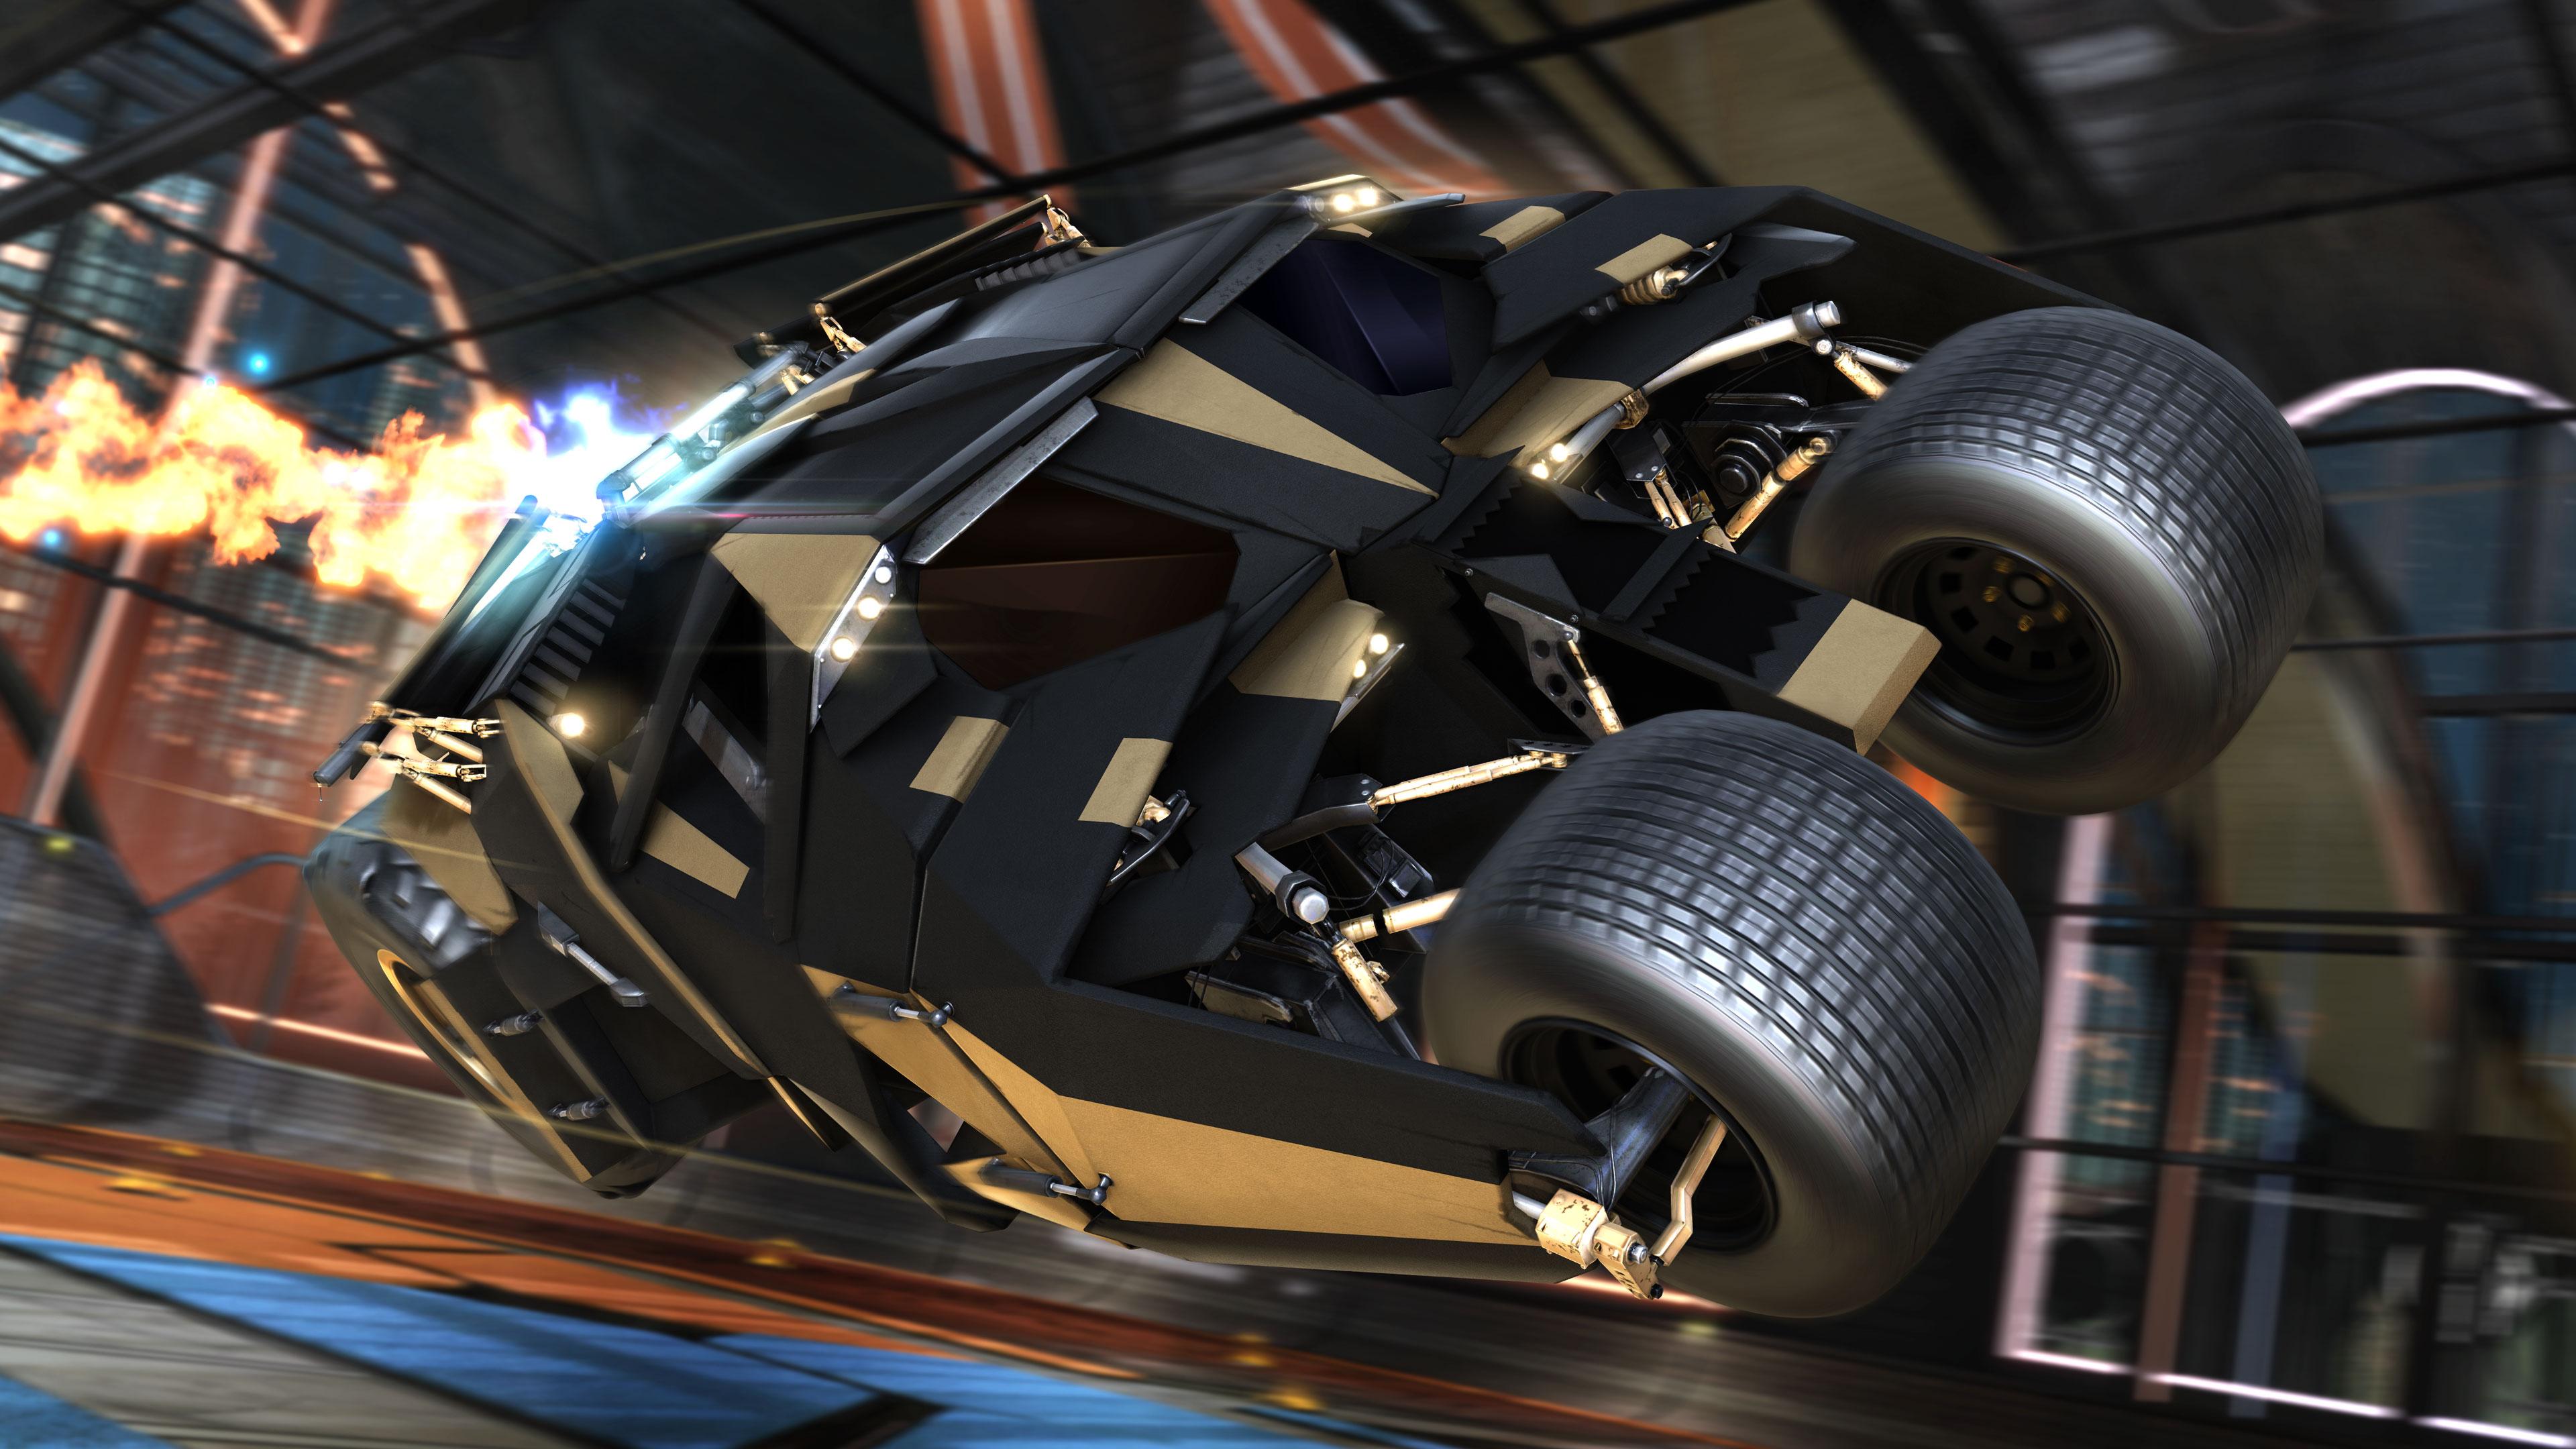 Batman Rocket League Dlc 4k, HD Games, 4k Wallpapers